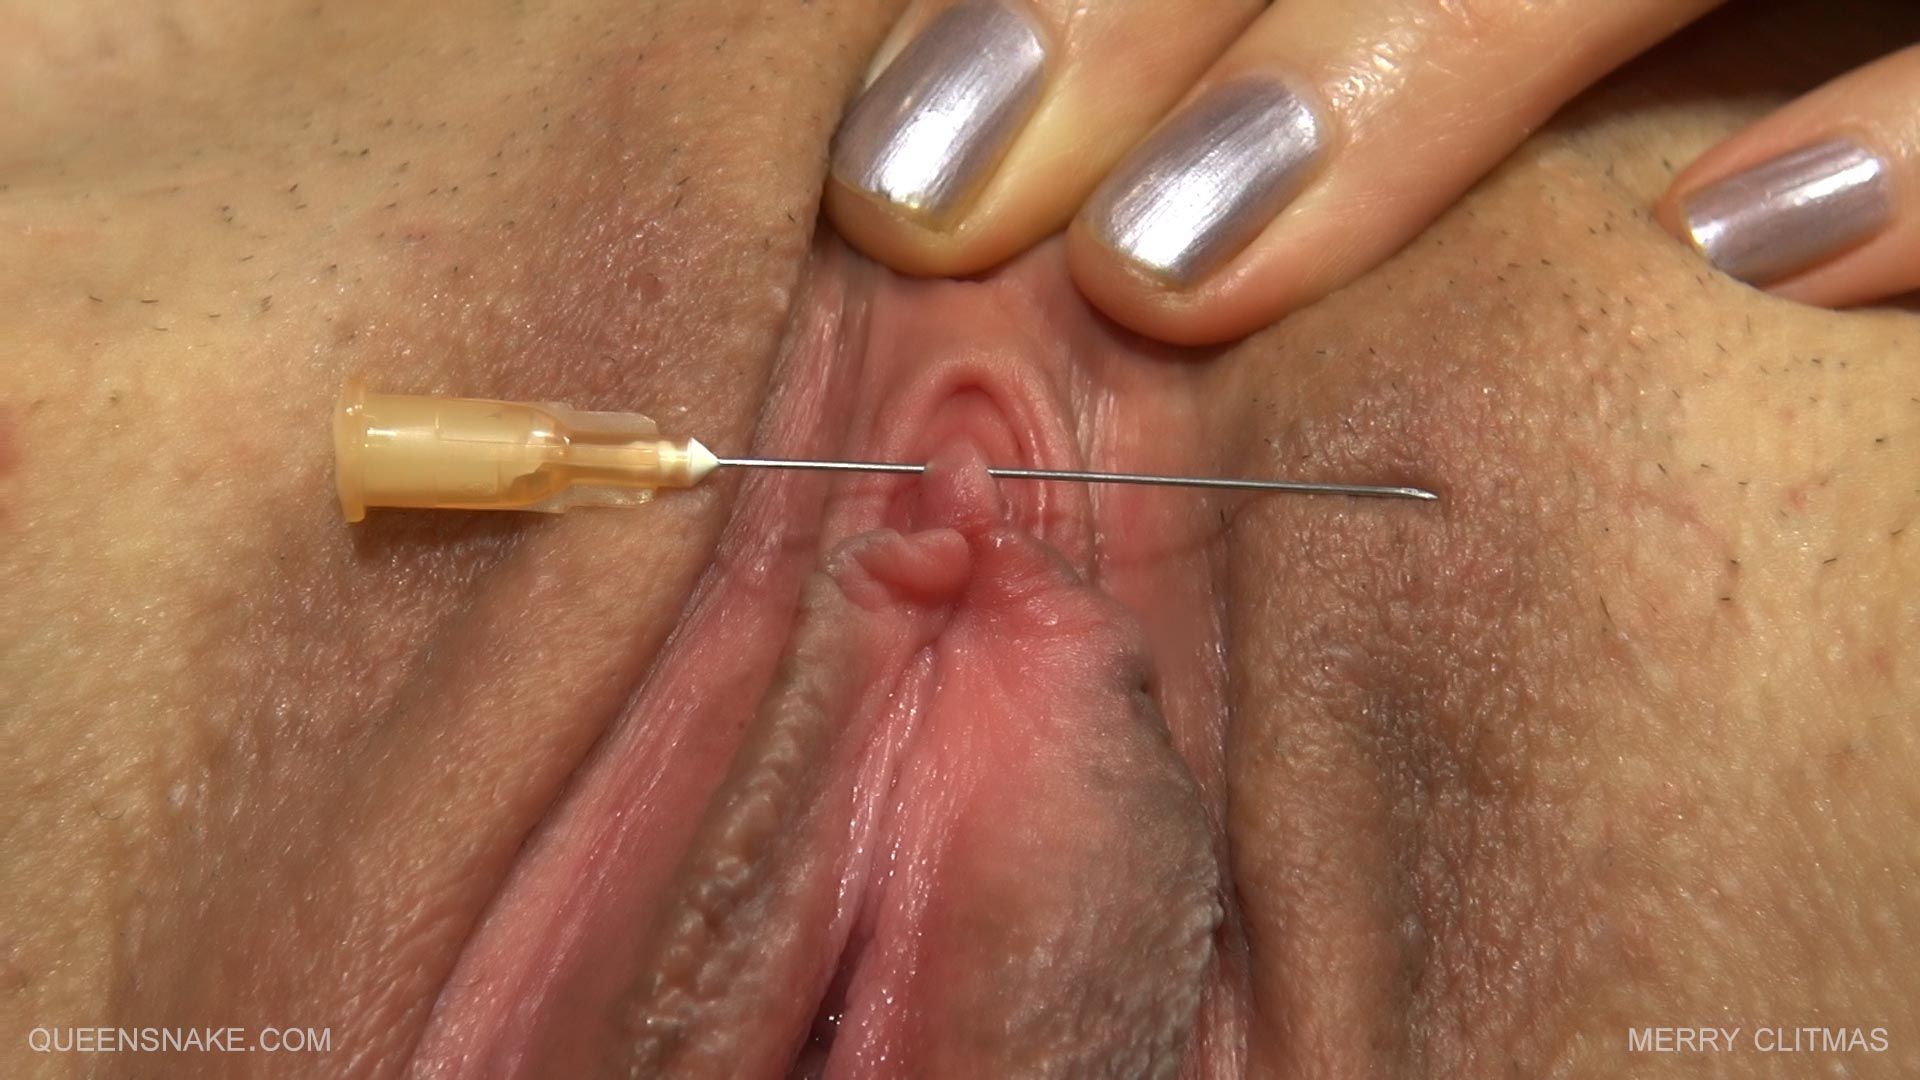 Needle in clit